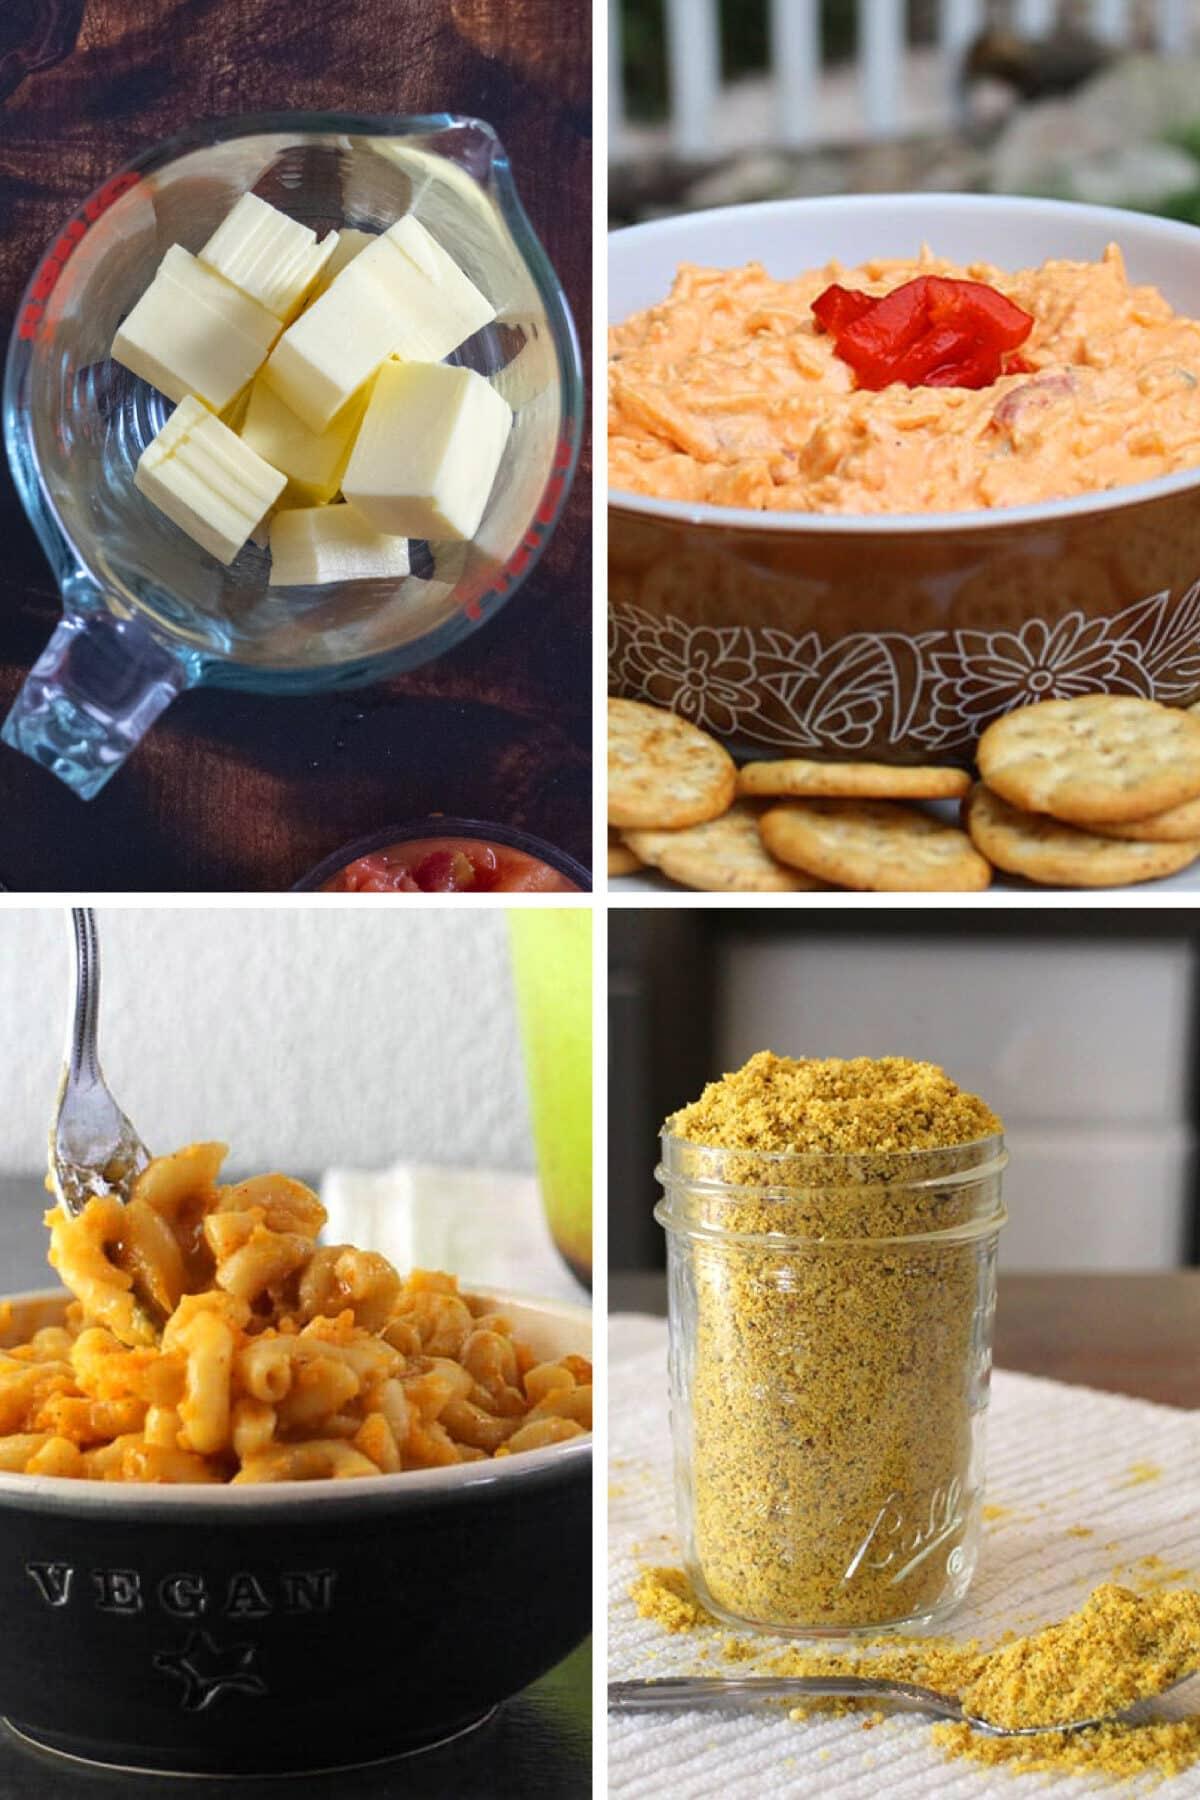 image collage showing: cubed vegan cheese, vegan pimento cheese, vegan mac and cheese, and vegan Parmesan sprinkles